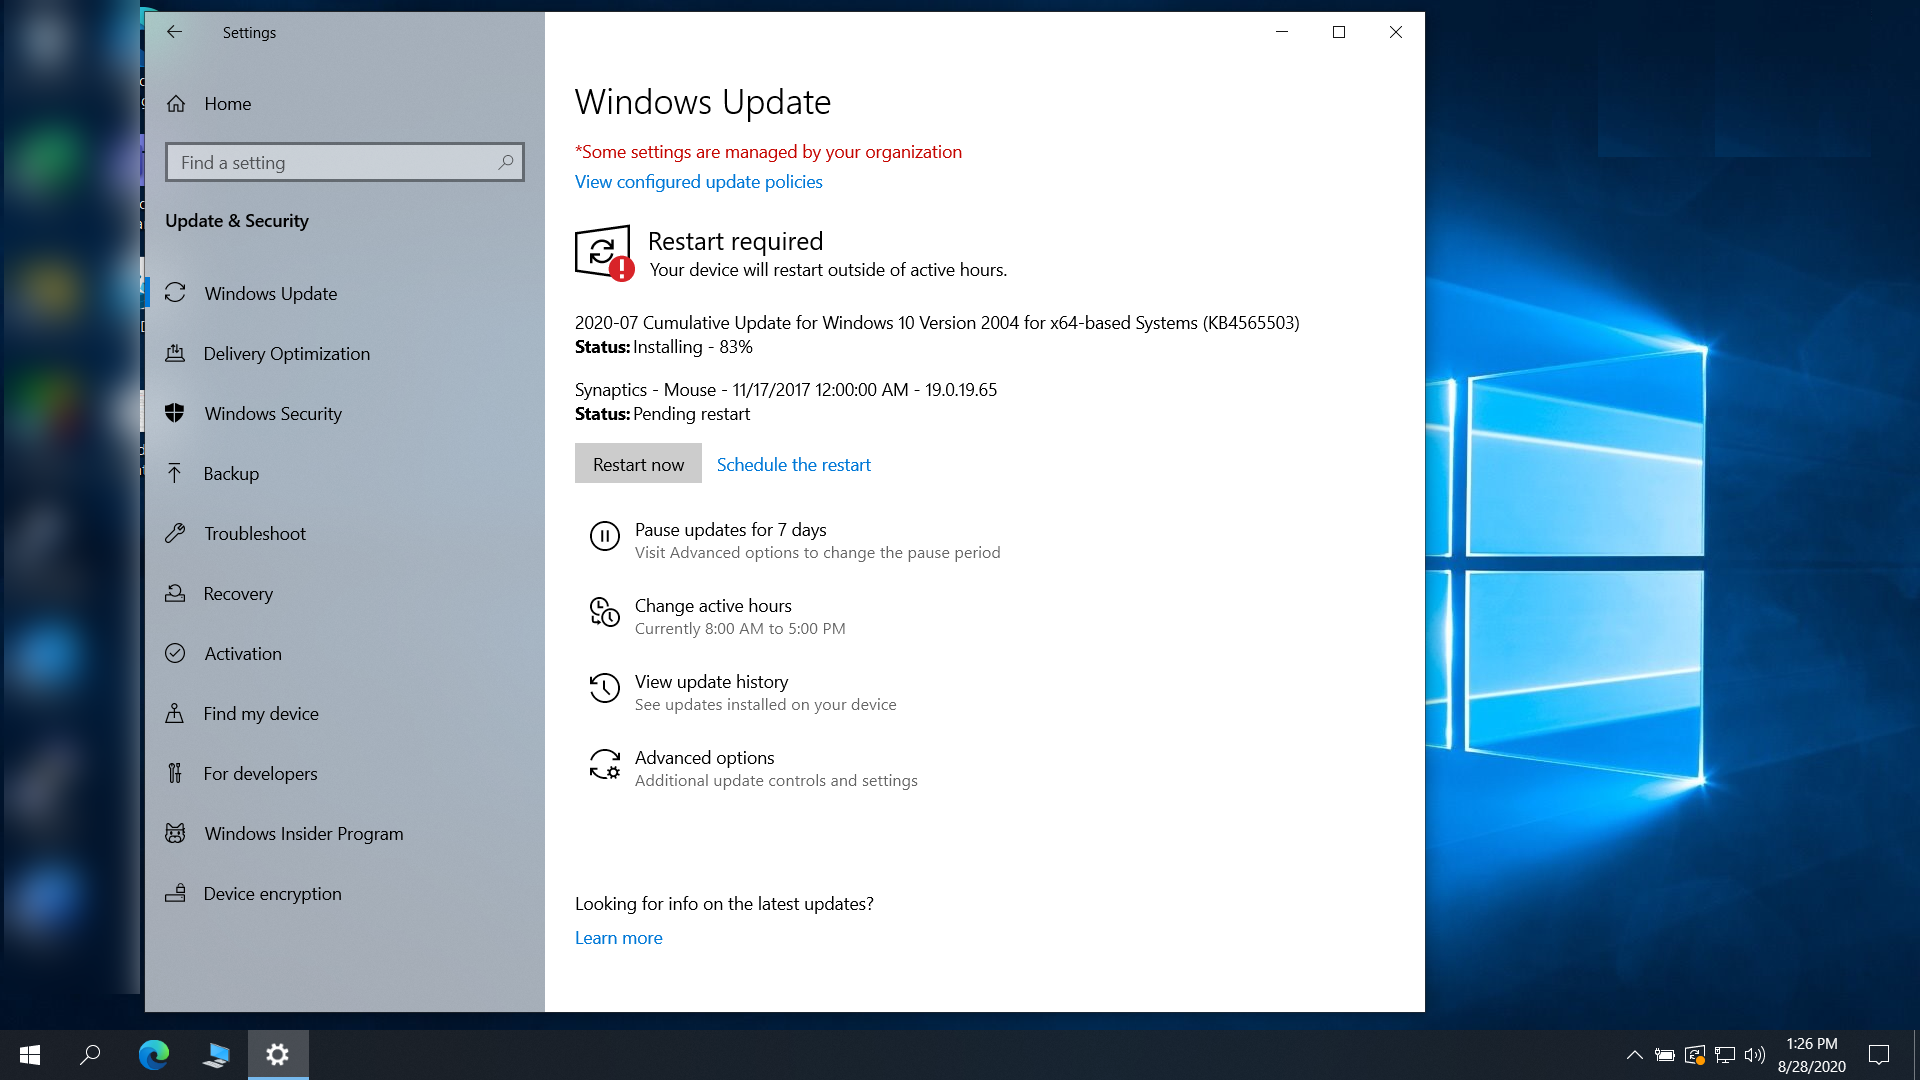 Windows 10 Automatic Repair Loop - Causes 48edb9c2-7a82-4042-b692-7c6330bc84eb?upload=true.png